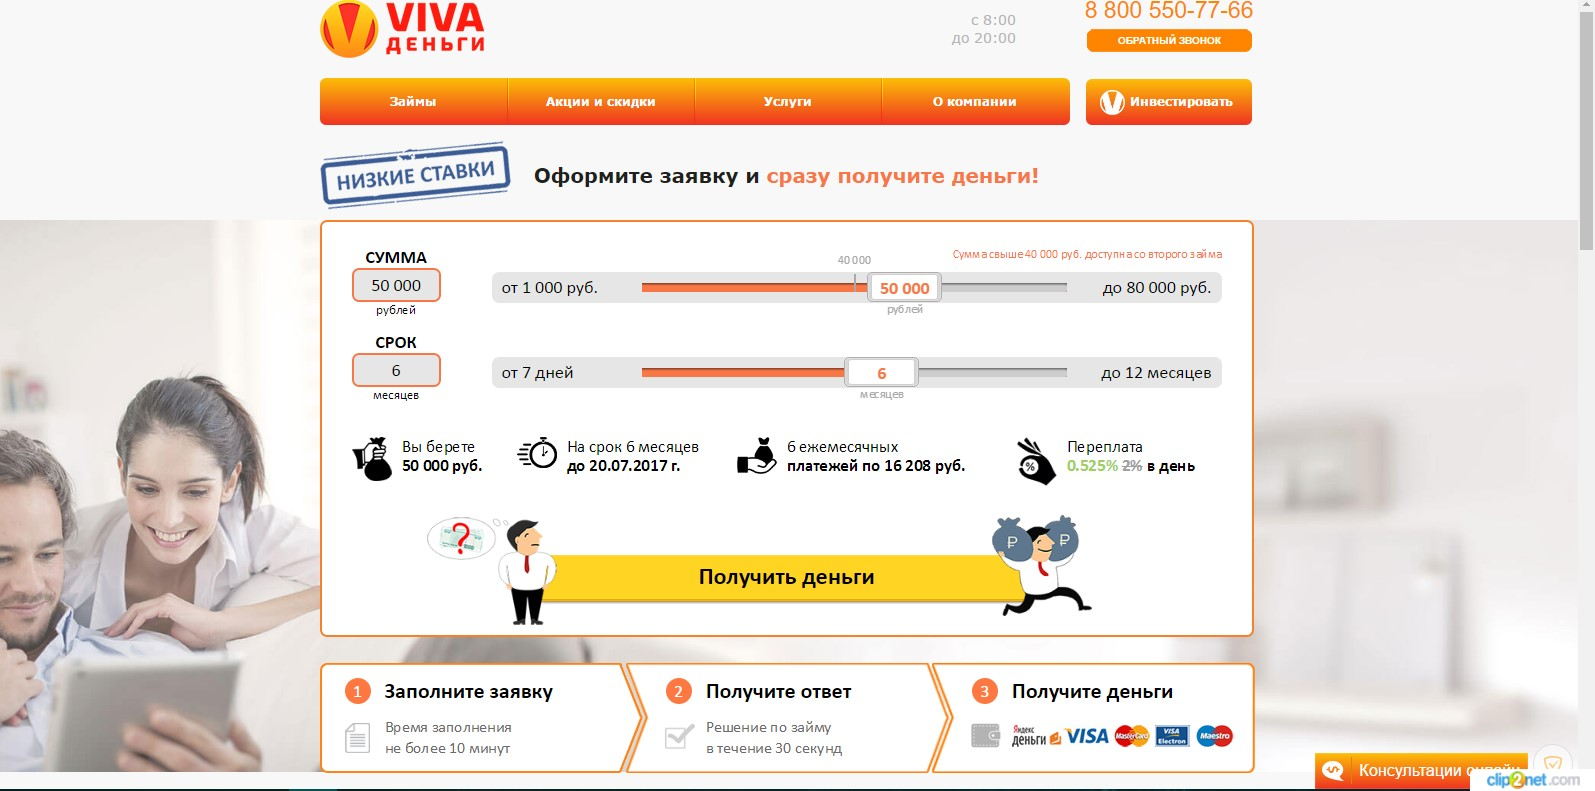 Viva деньги онлайн заявка на кредит взять кредит на карточку